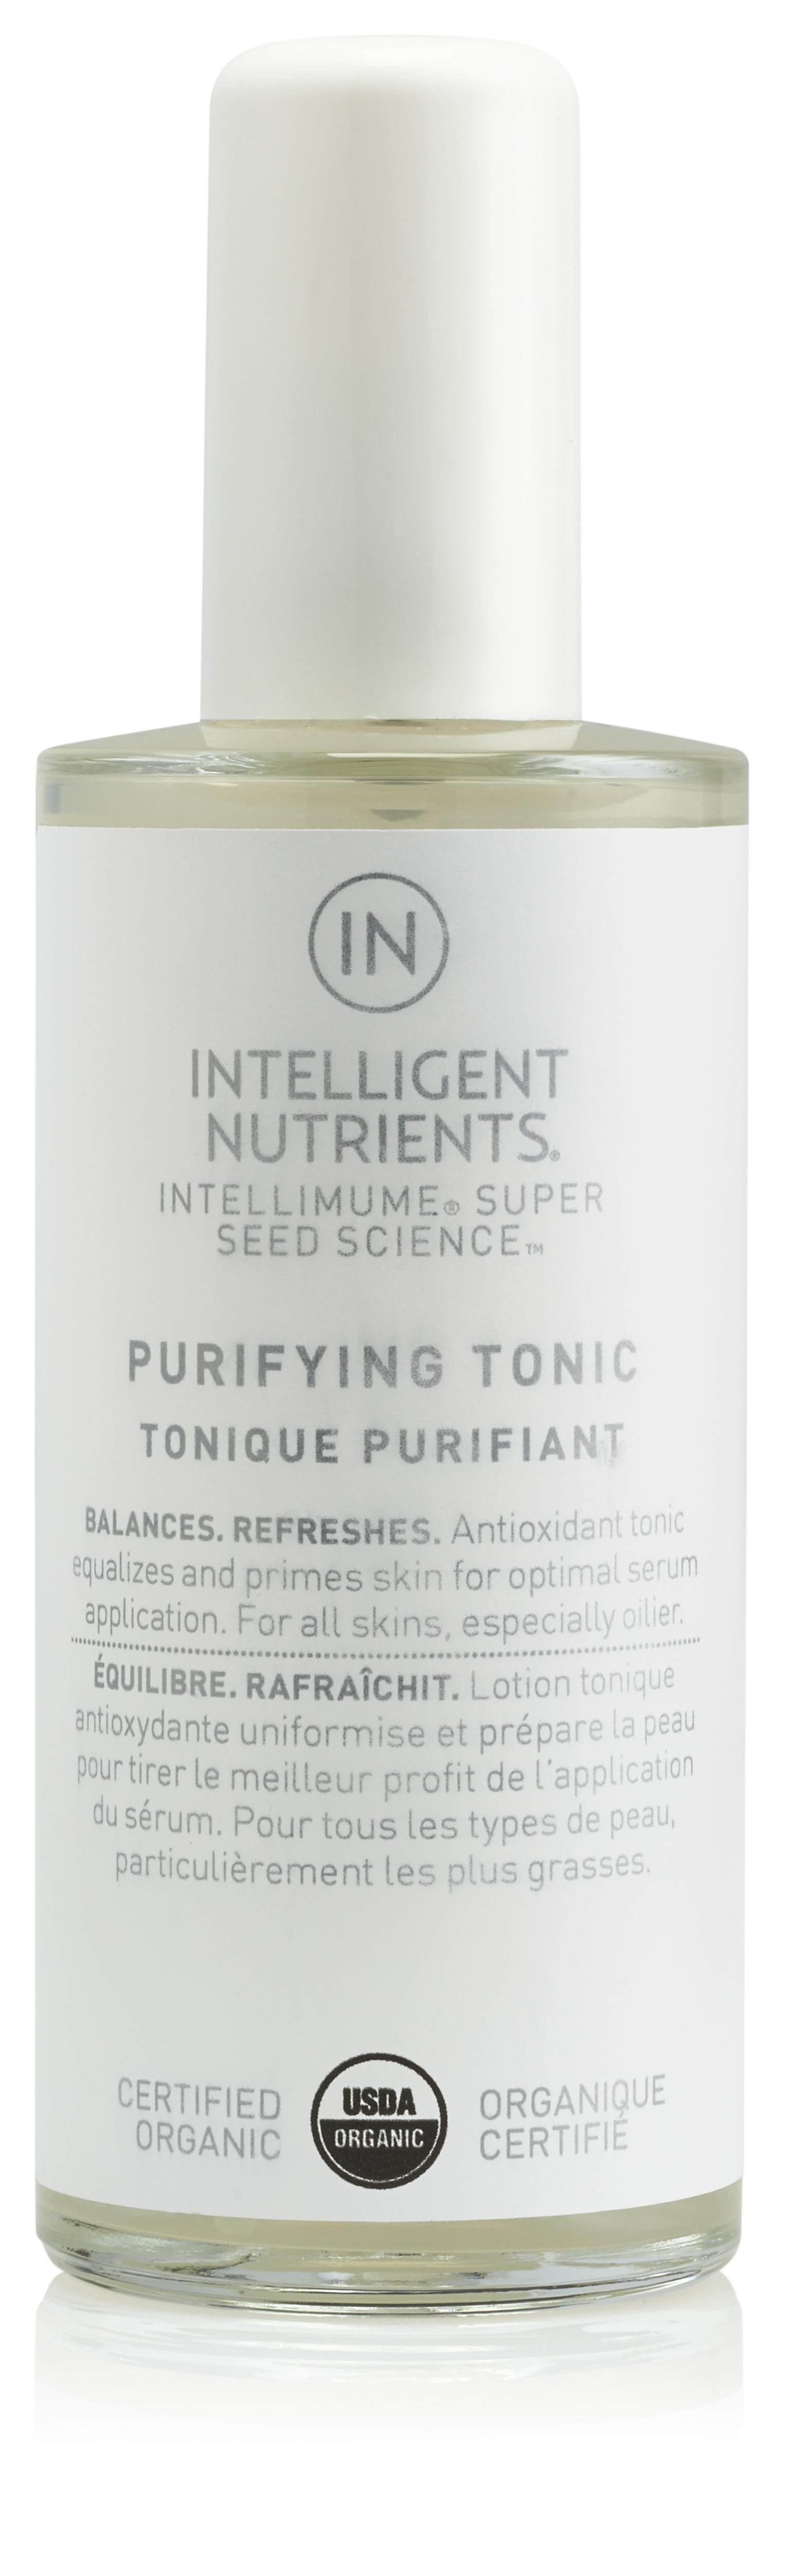 Purifying Tonic (DKK305/50ml)